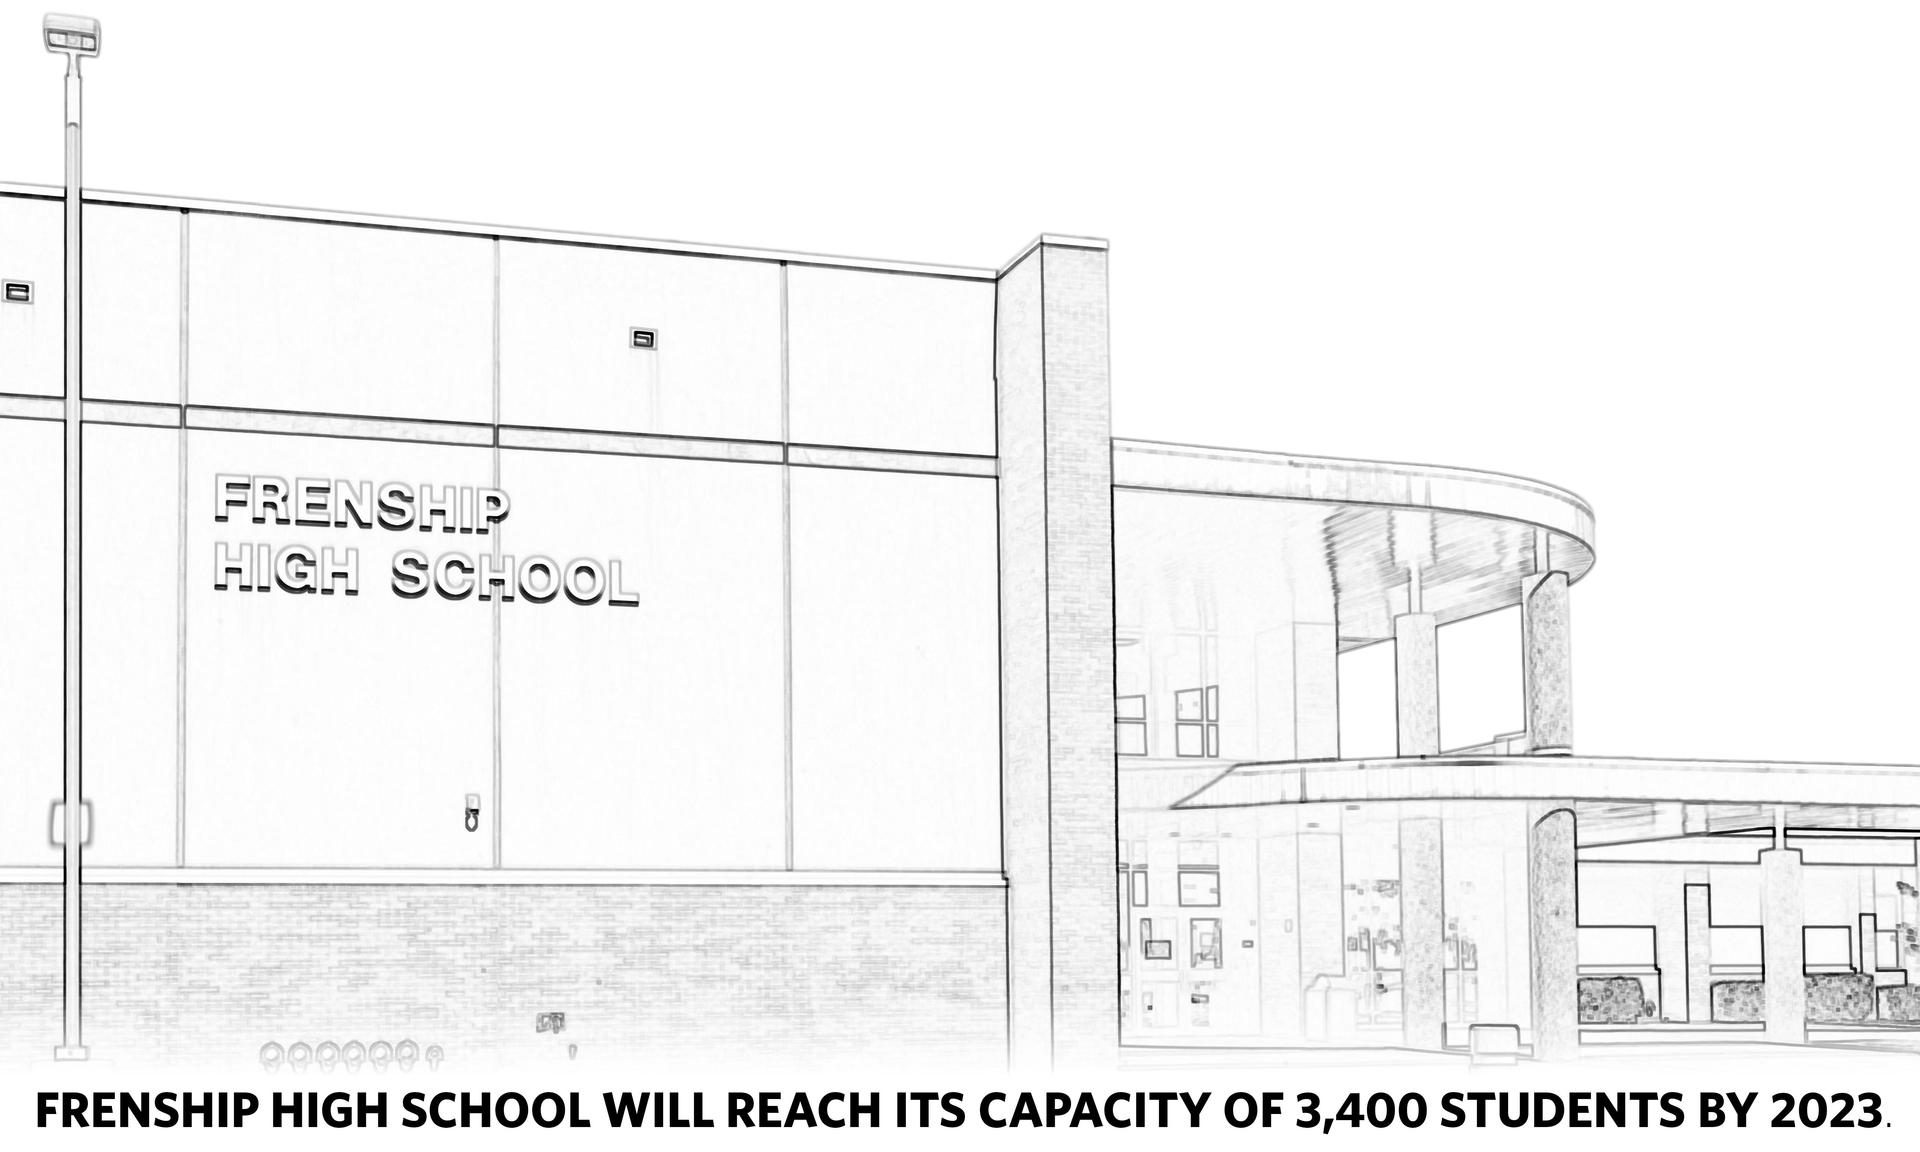 FHS will reach capacity in 2023